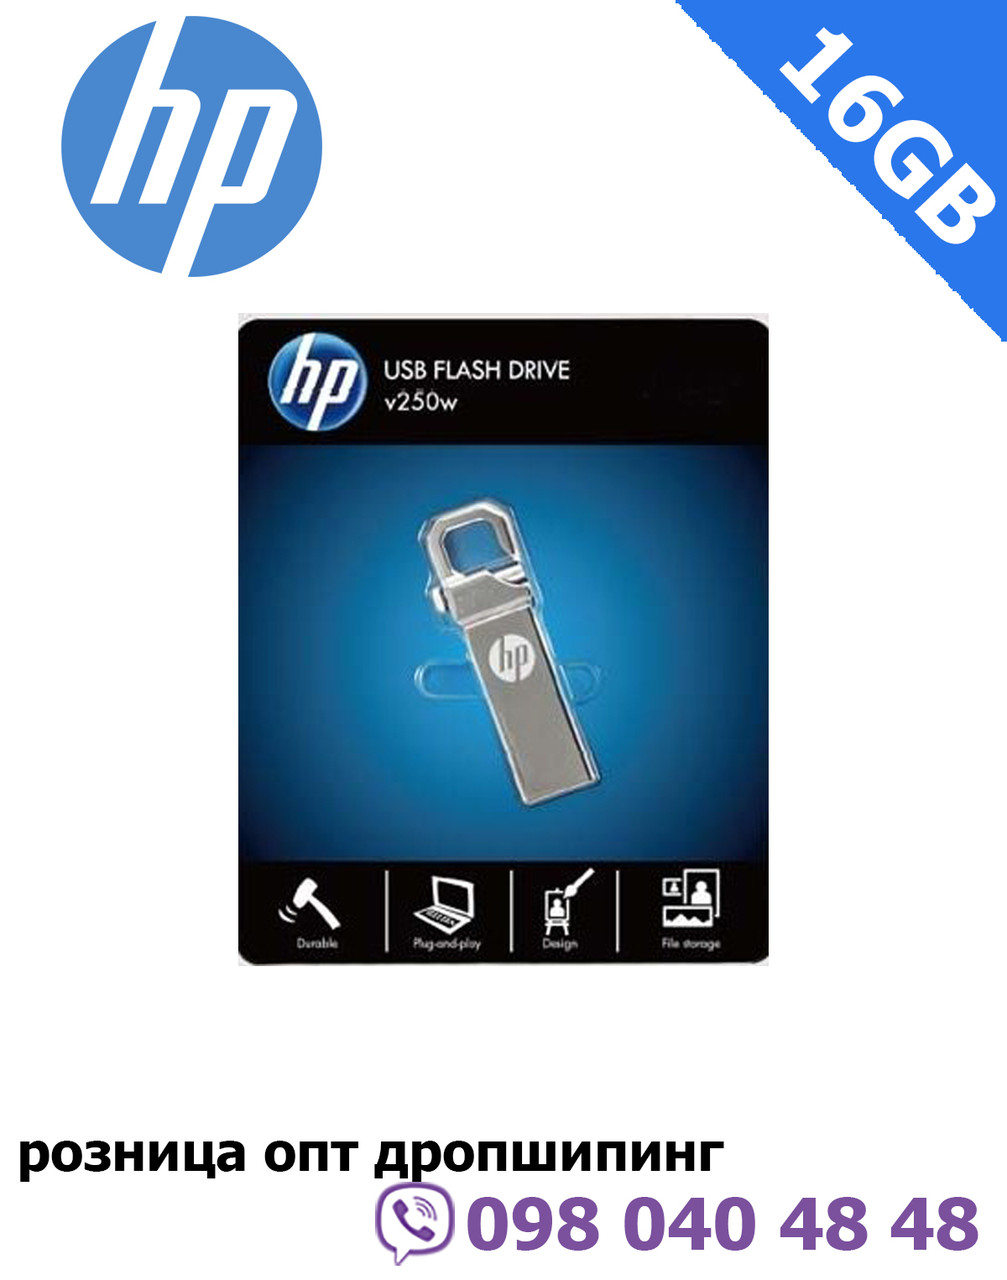 USB Флешка, HP v250w USB Flash Drive 16 ГБ. HP 16 GB Гарантия